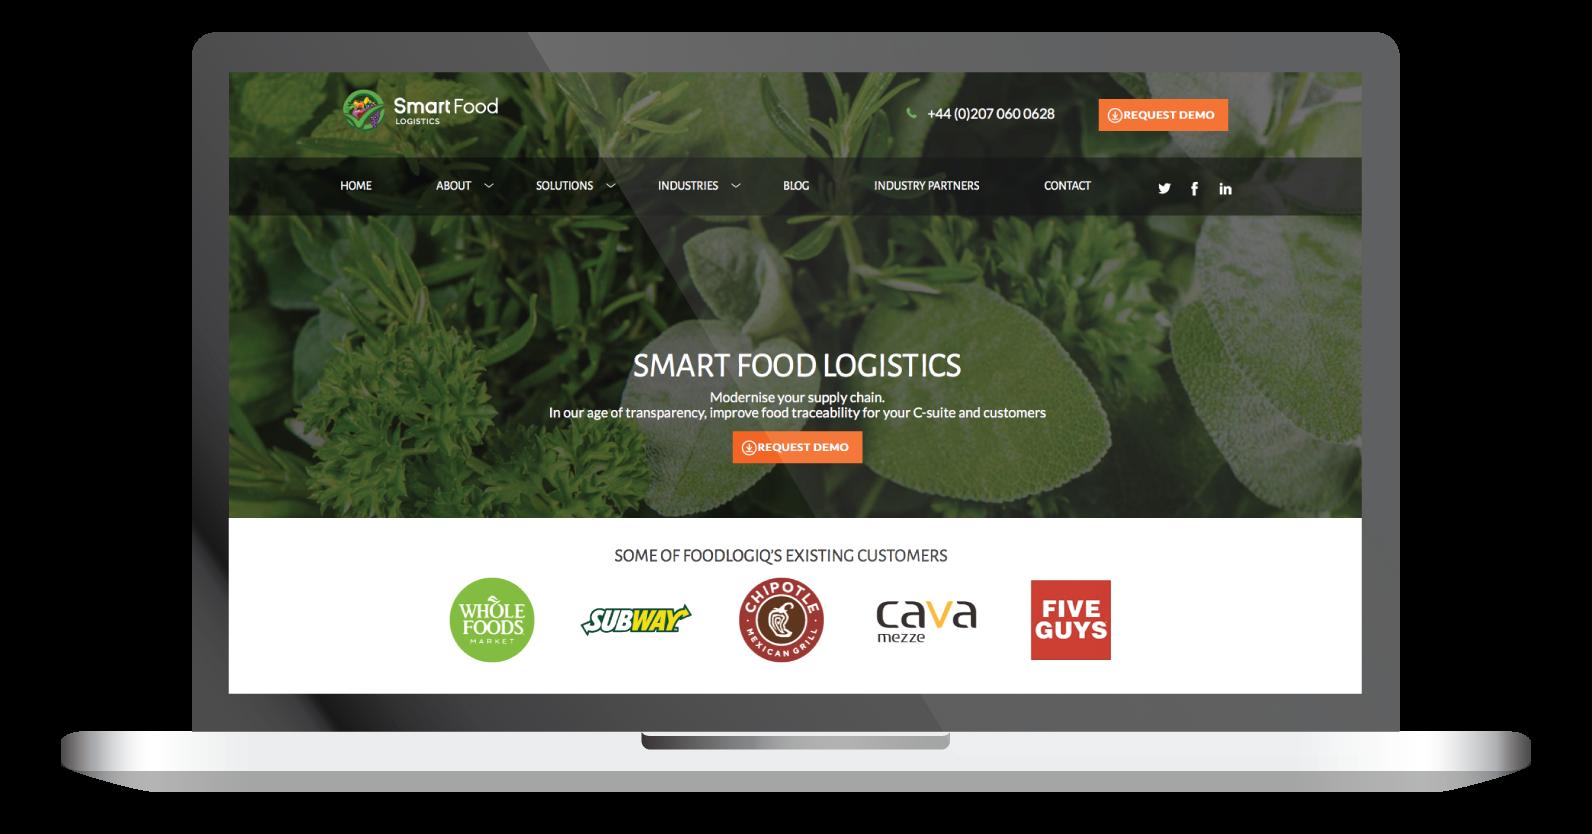 smartfood logistics laptop home page